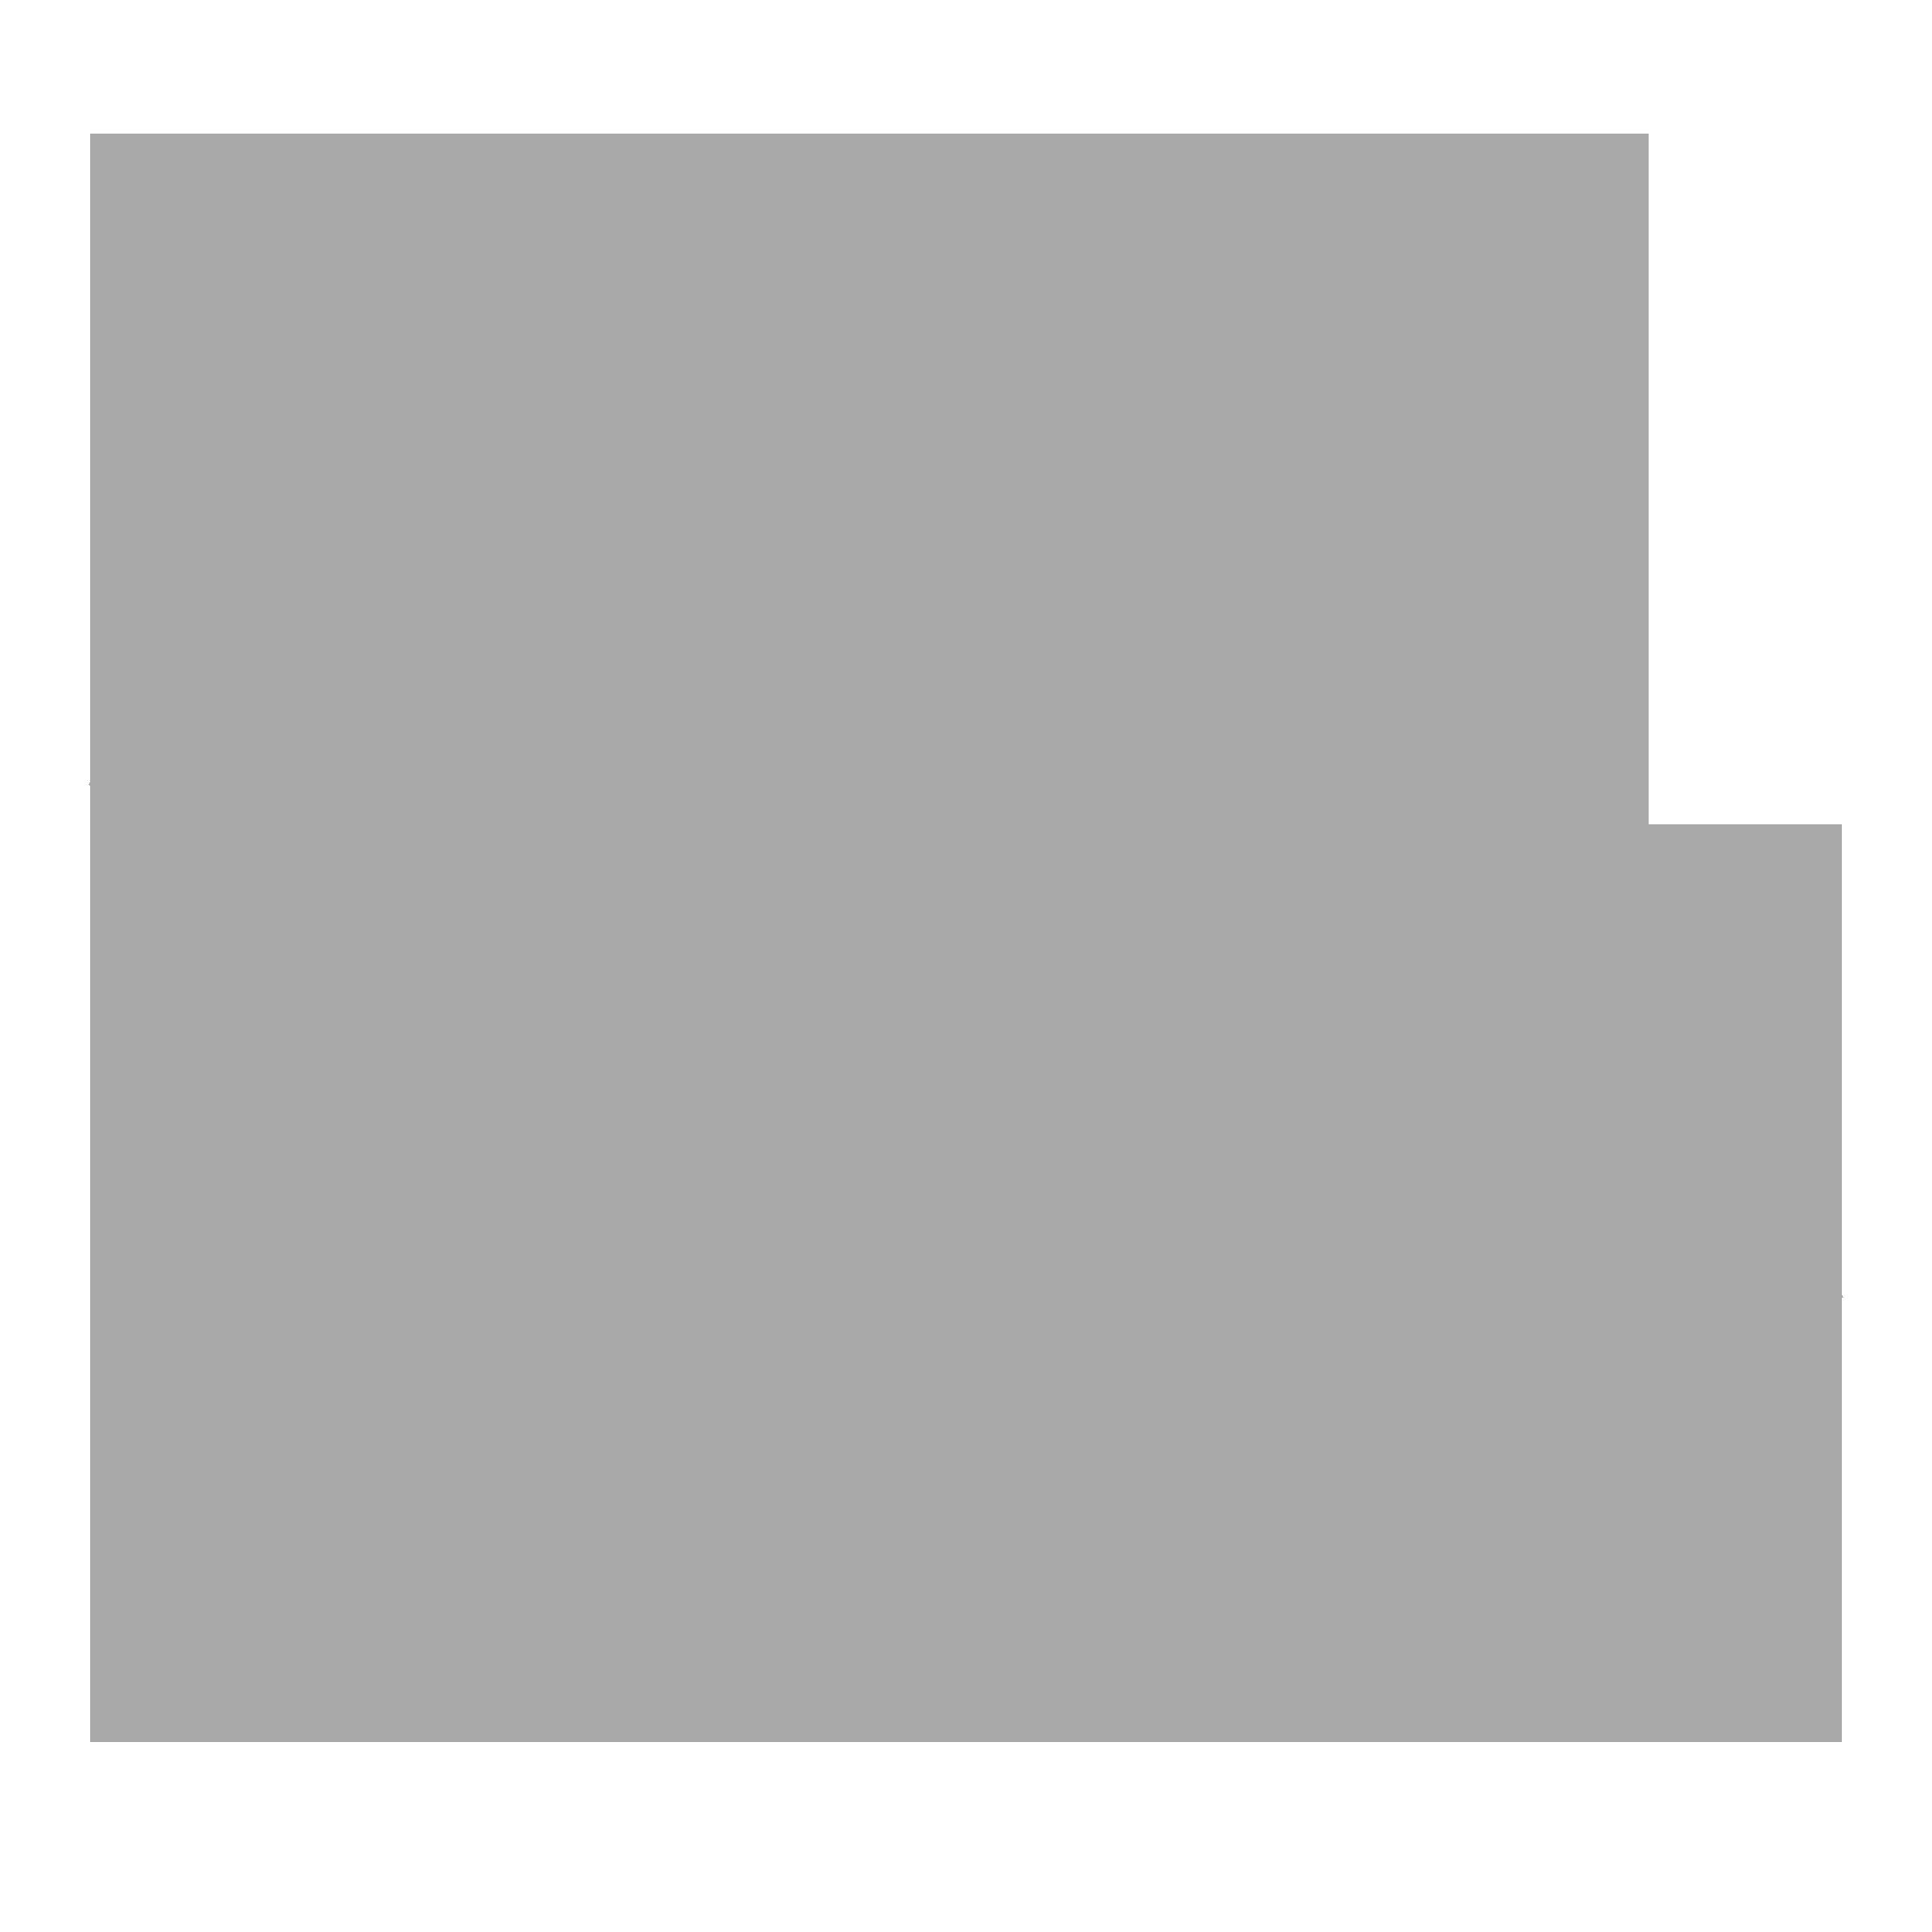 novatel-logo-png-transparent